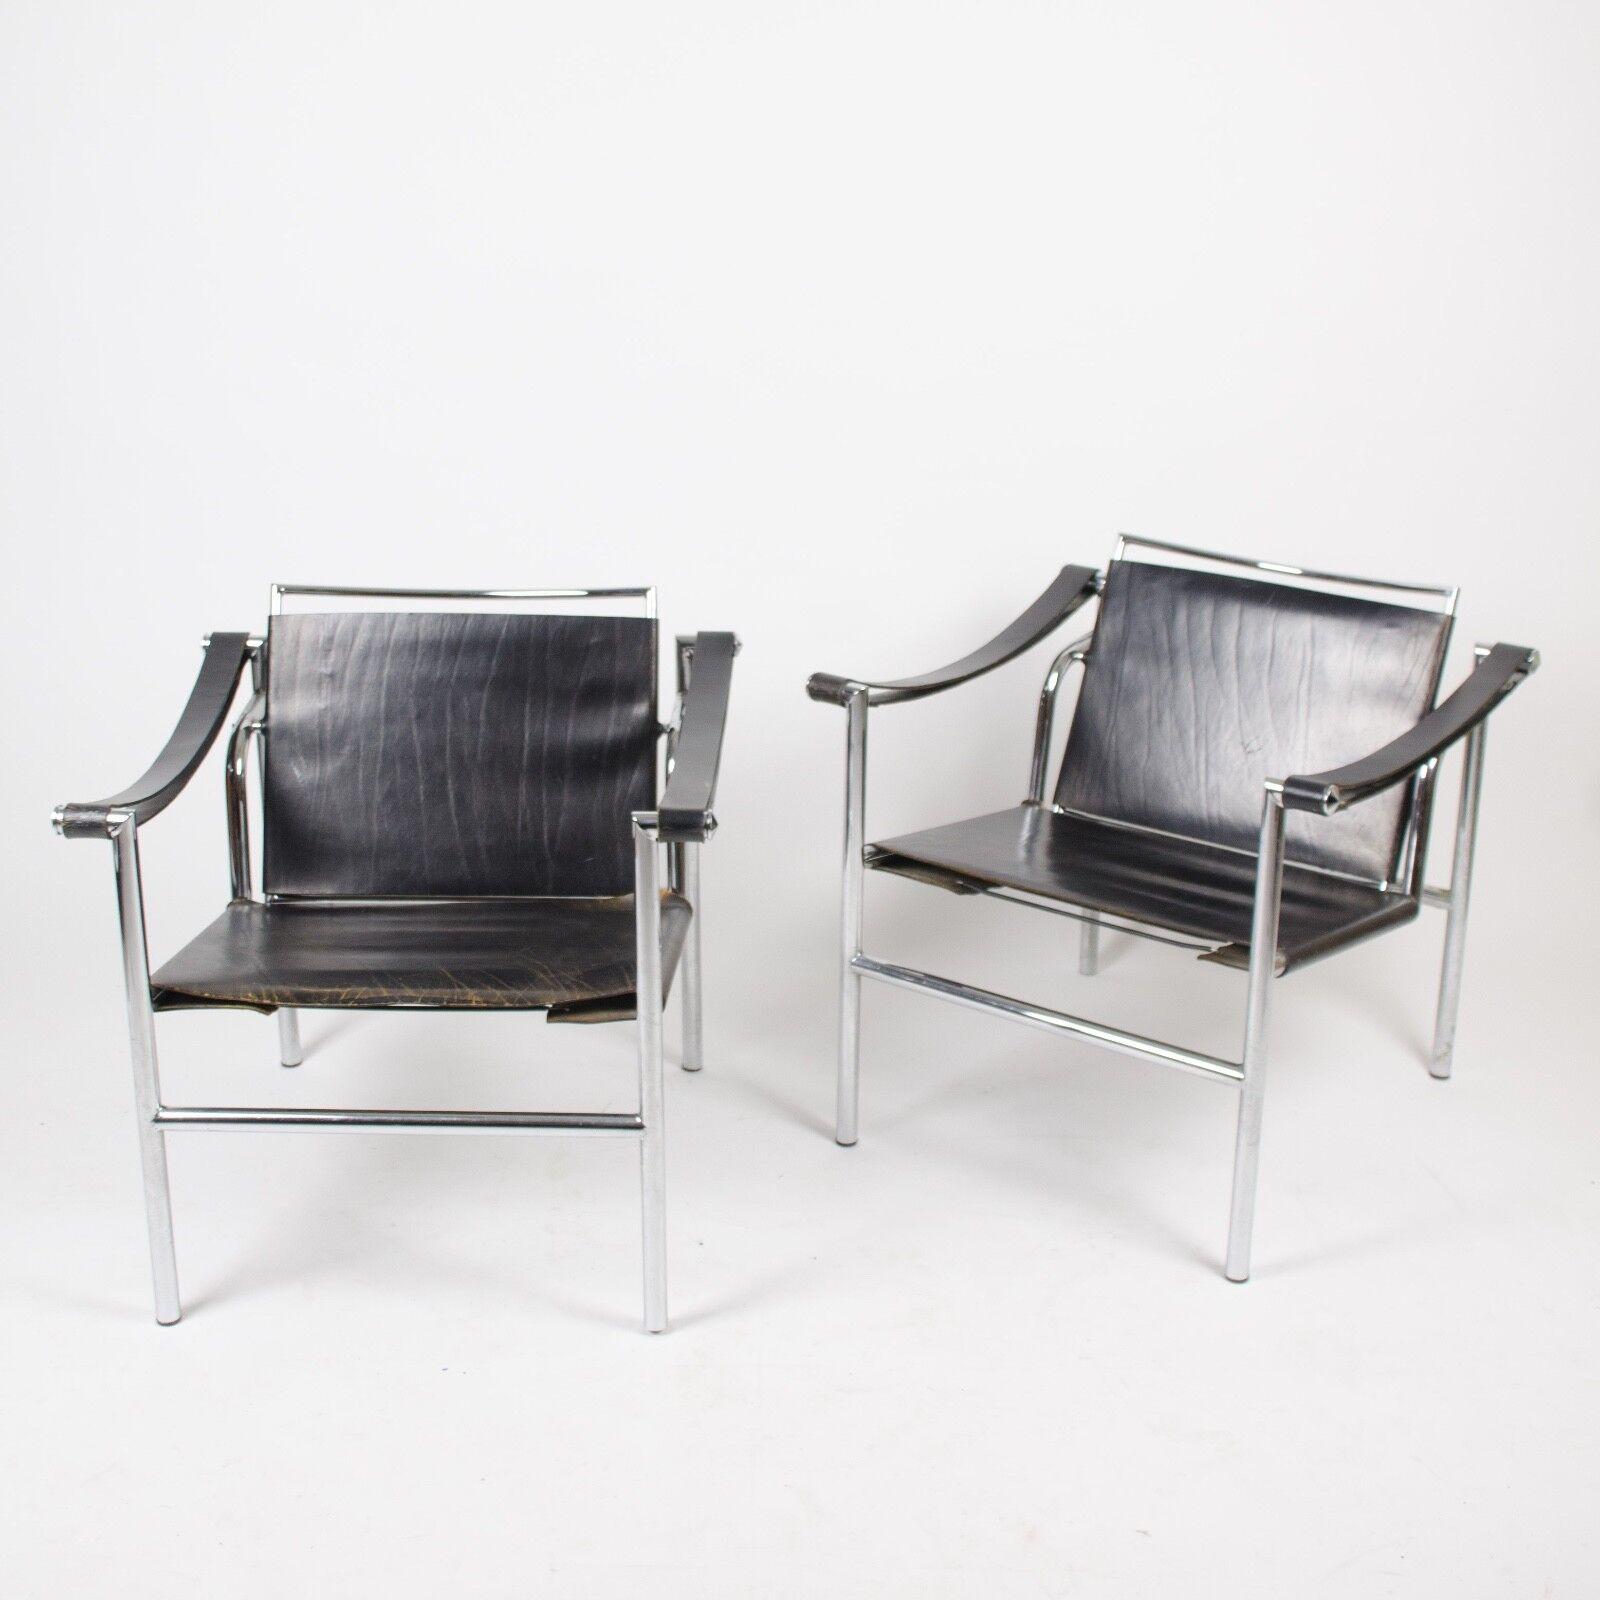 Semplice Design Le Corbusier Lc1 Basculant Sling Chair